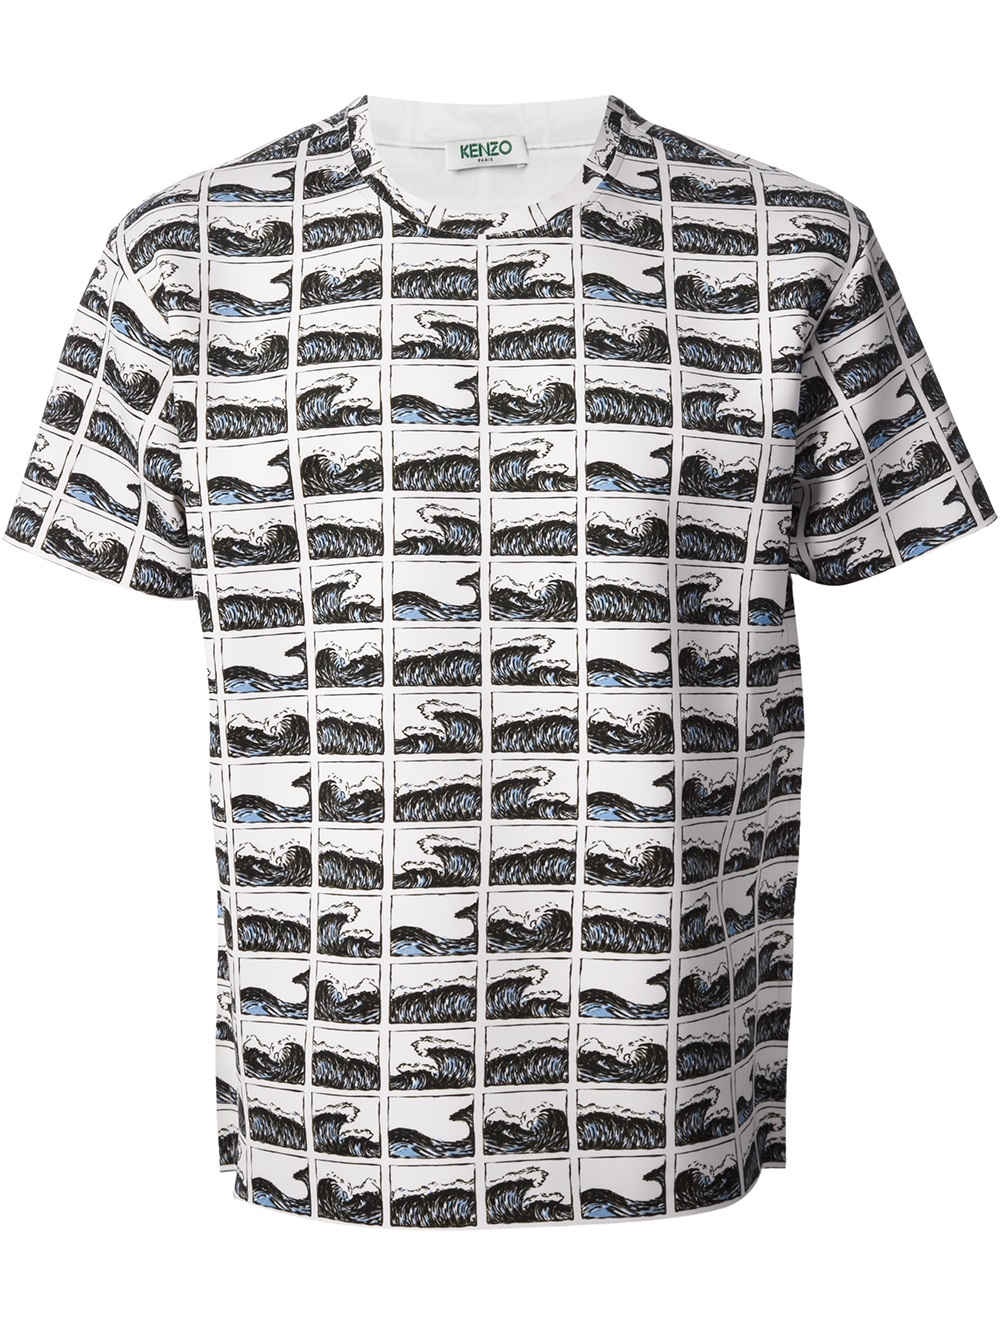 8f4c4a567db8 Kenzo Wave Printed Tshirt in Black for Men - Lyst